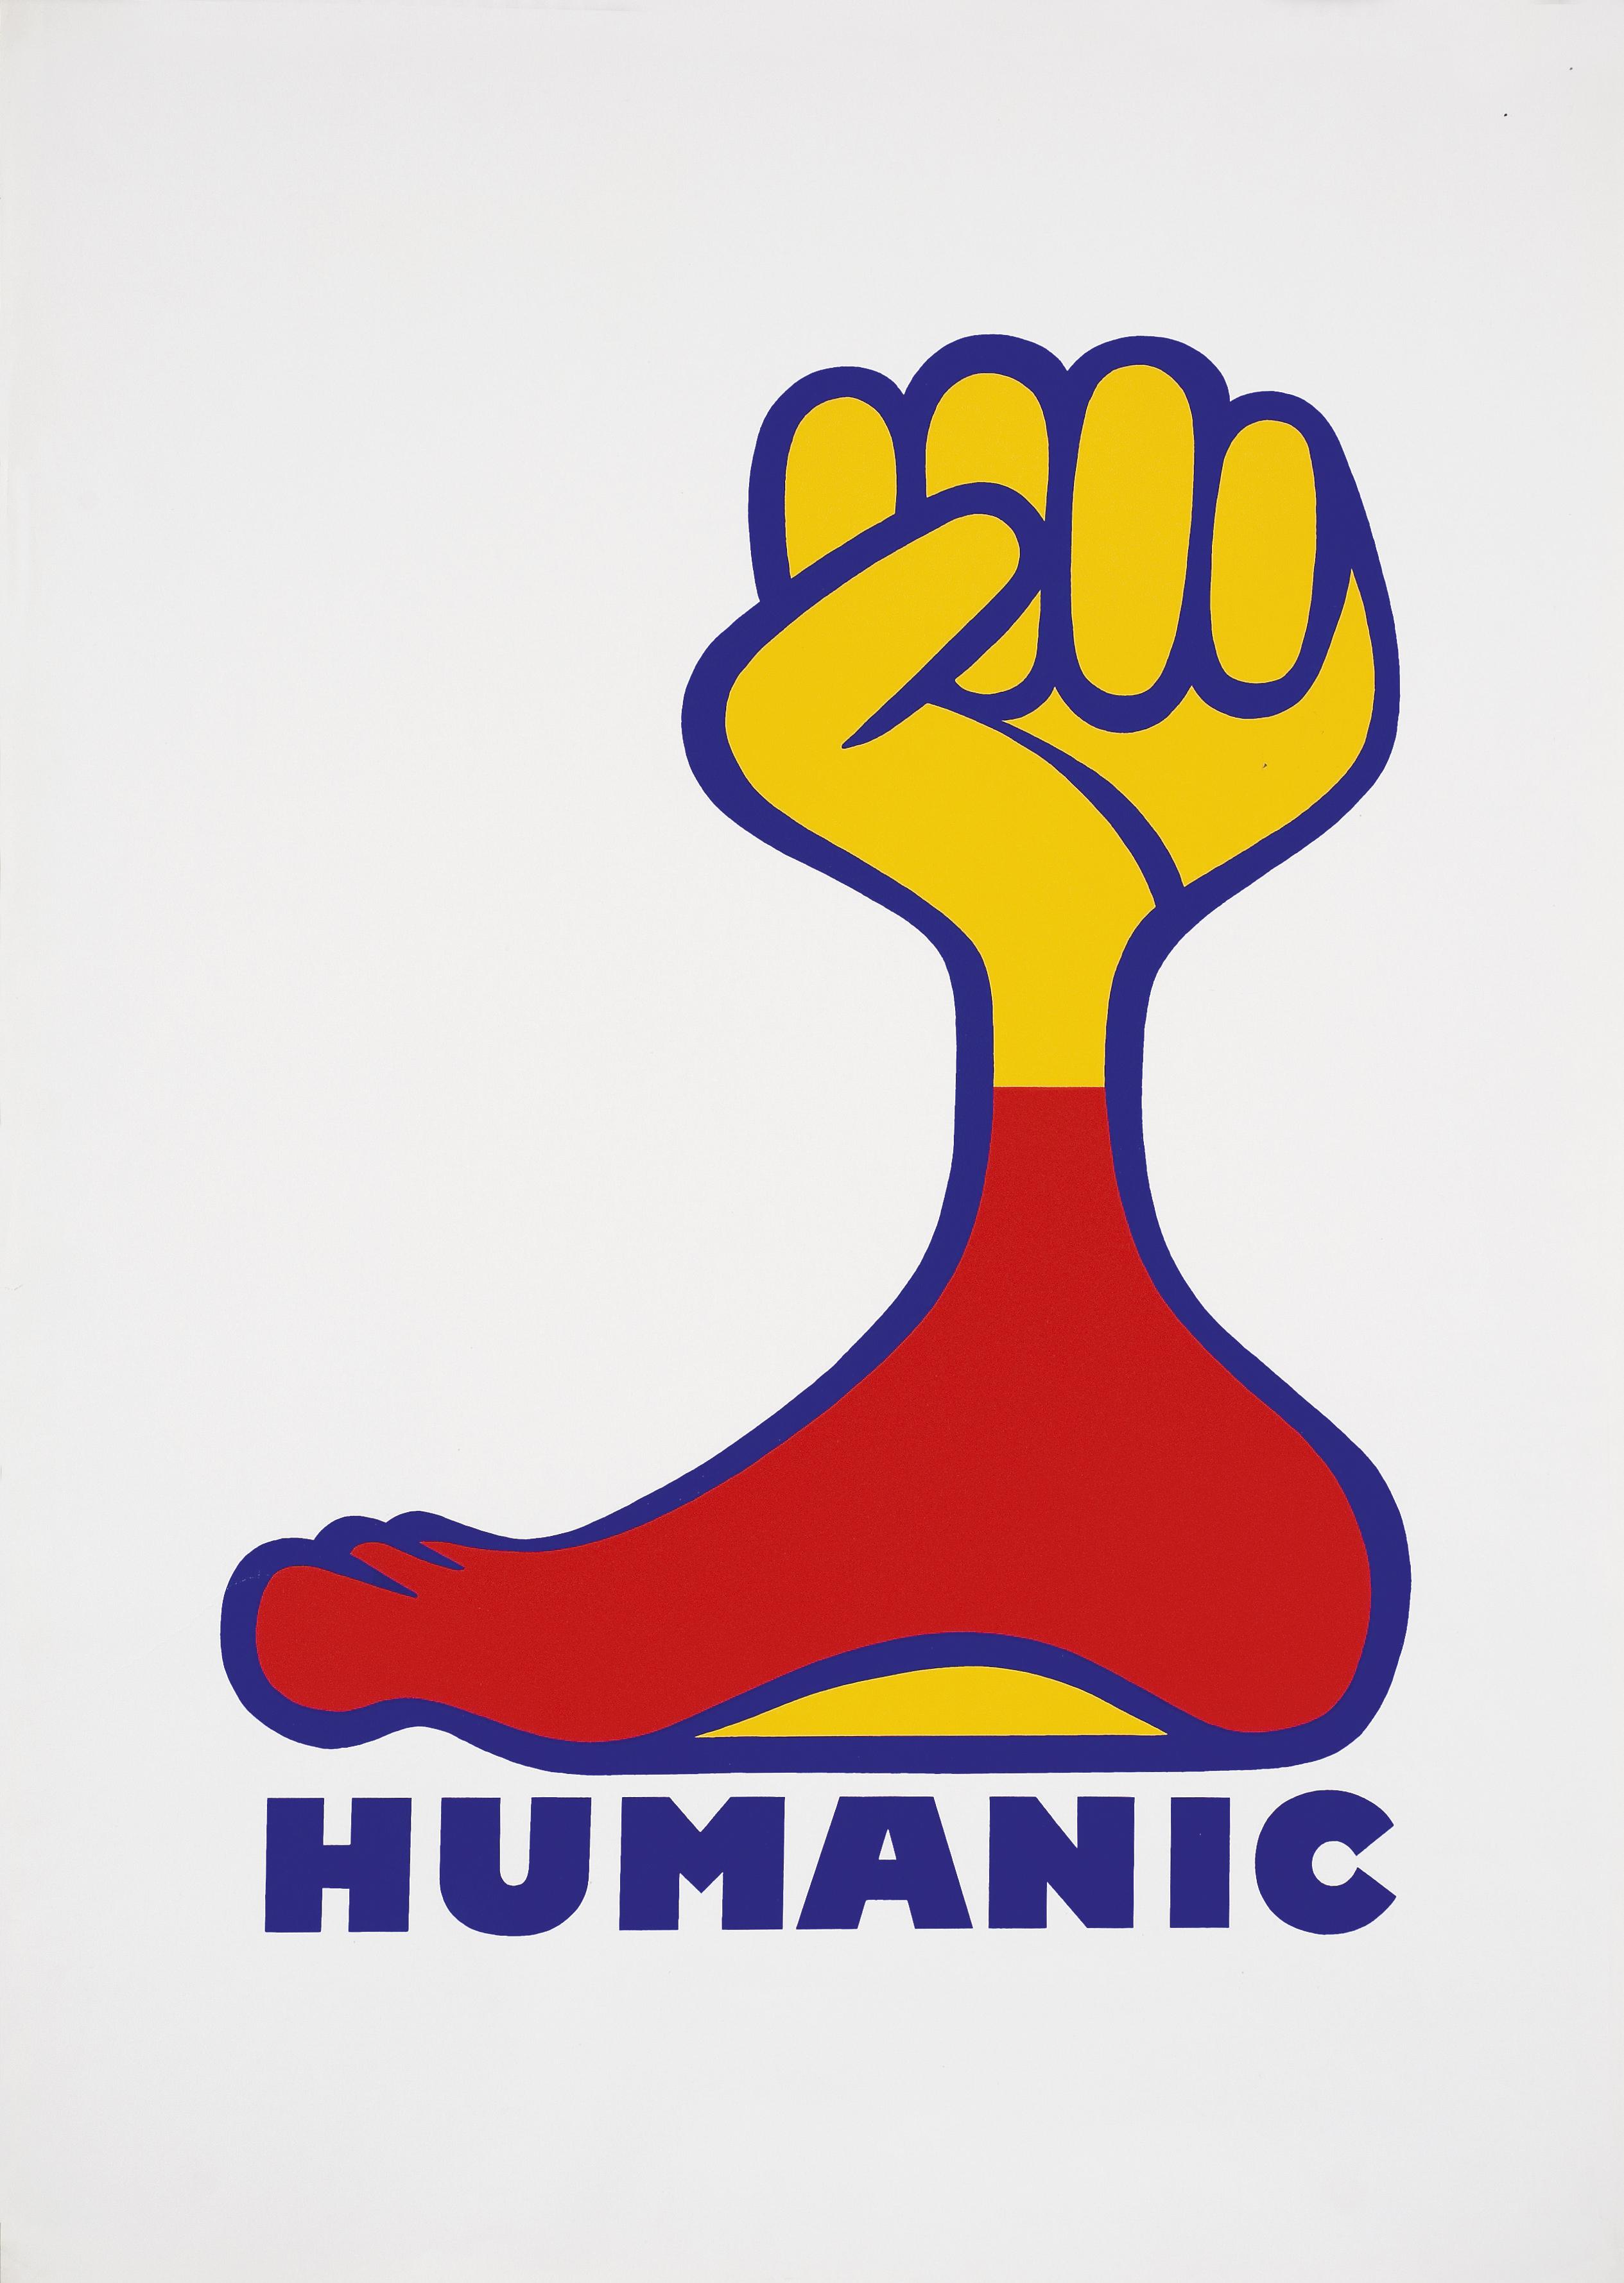 Karl Neubacher, HUMANIC franz, ca. 1974, 58,8 x 83,8, Courtesy Privatsammlung